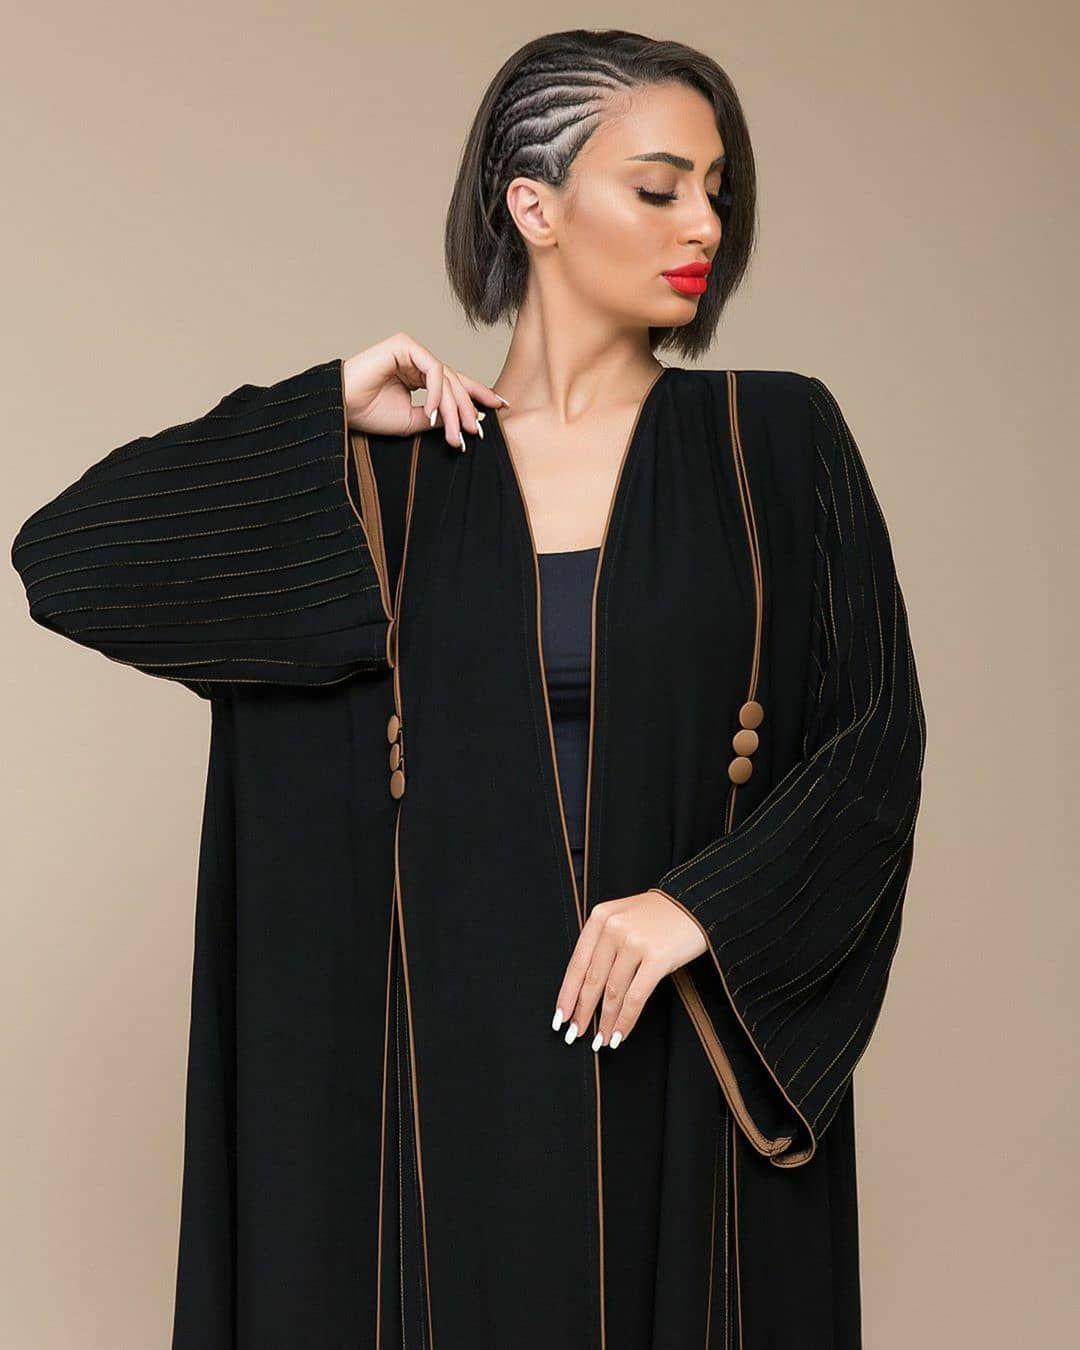 Repost Nagda Model Sm024 Subhanabayas Abaya Abayas Openabaya Uae Dubai Ksa Kuwait Bahrain Om Abaya Fashion Fashion Blog Abaya Designs